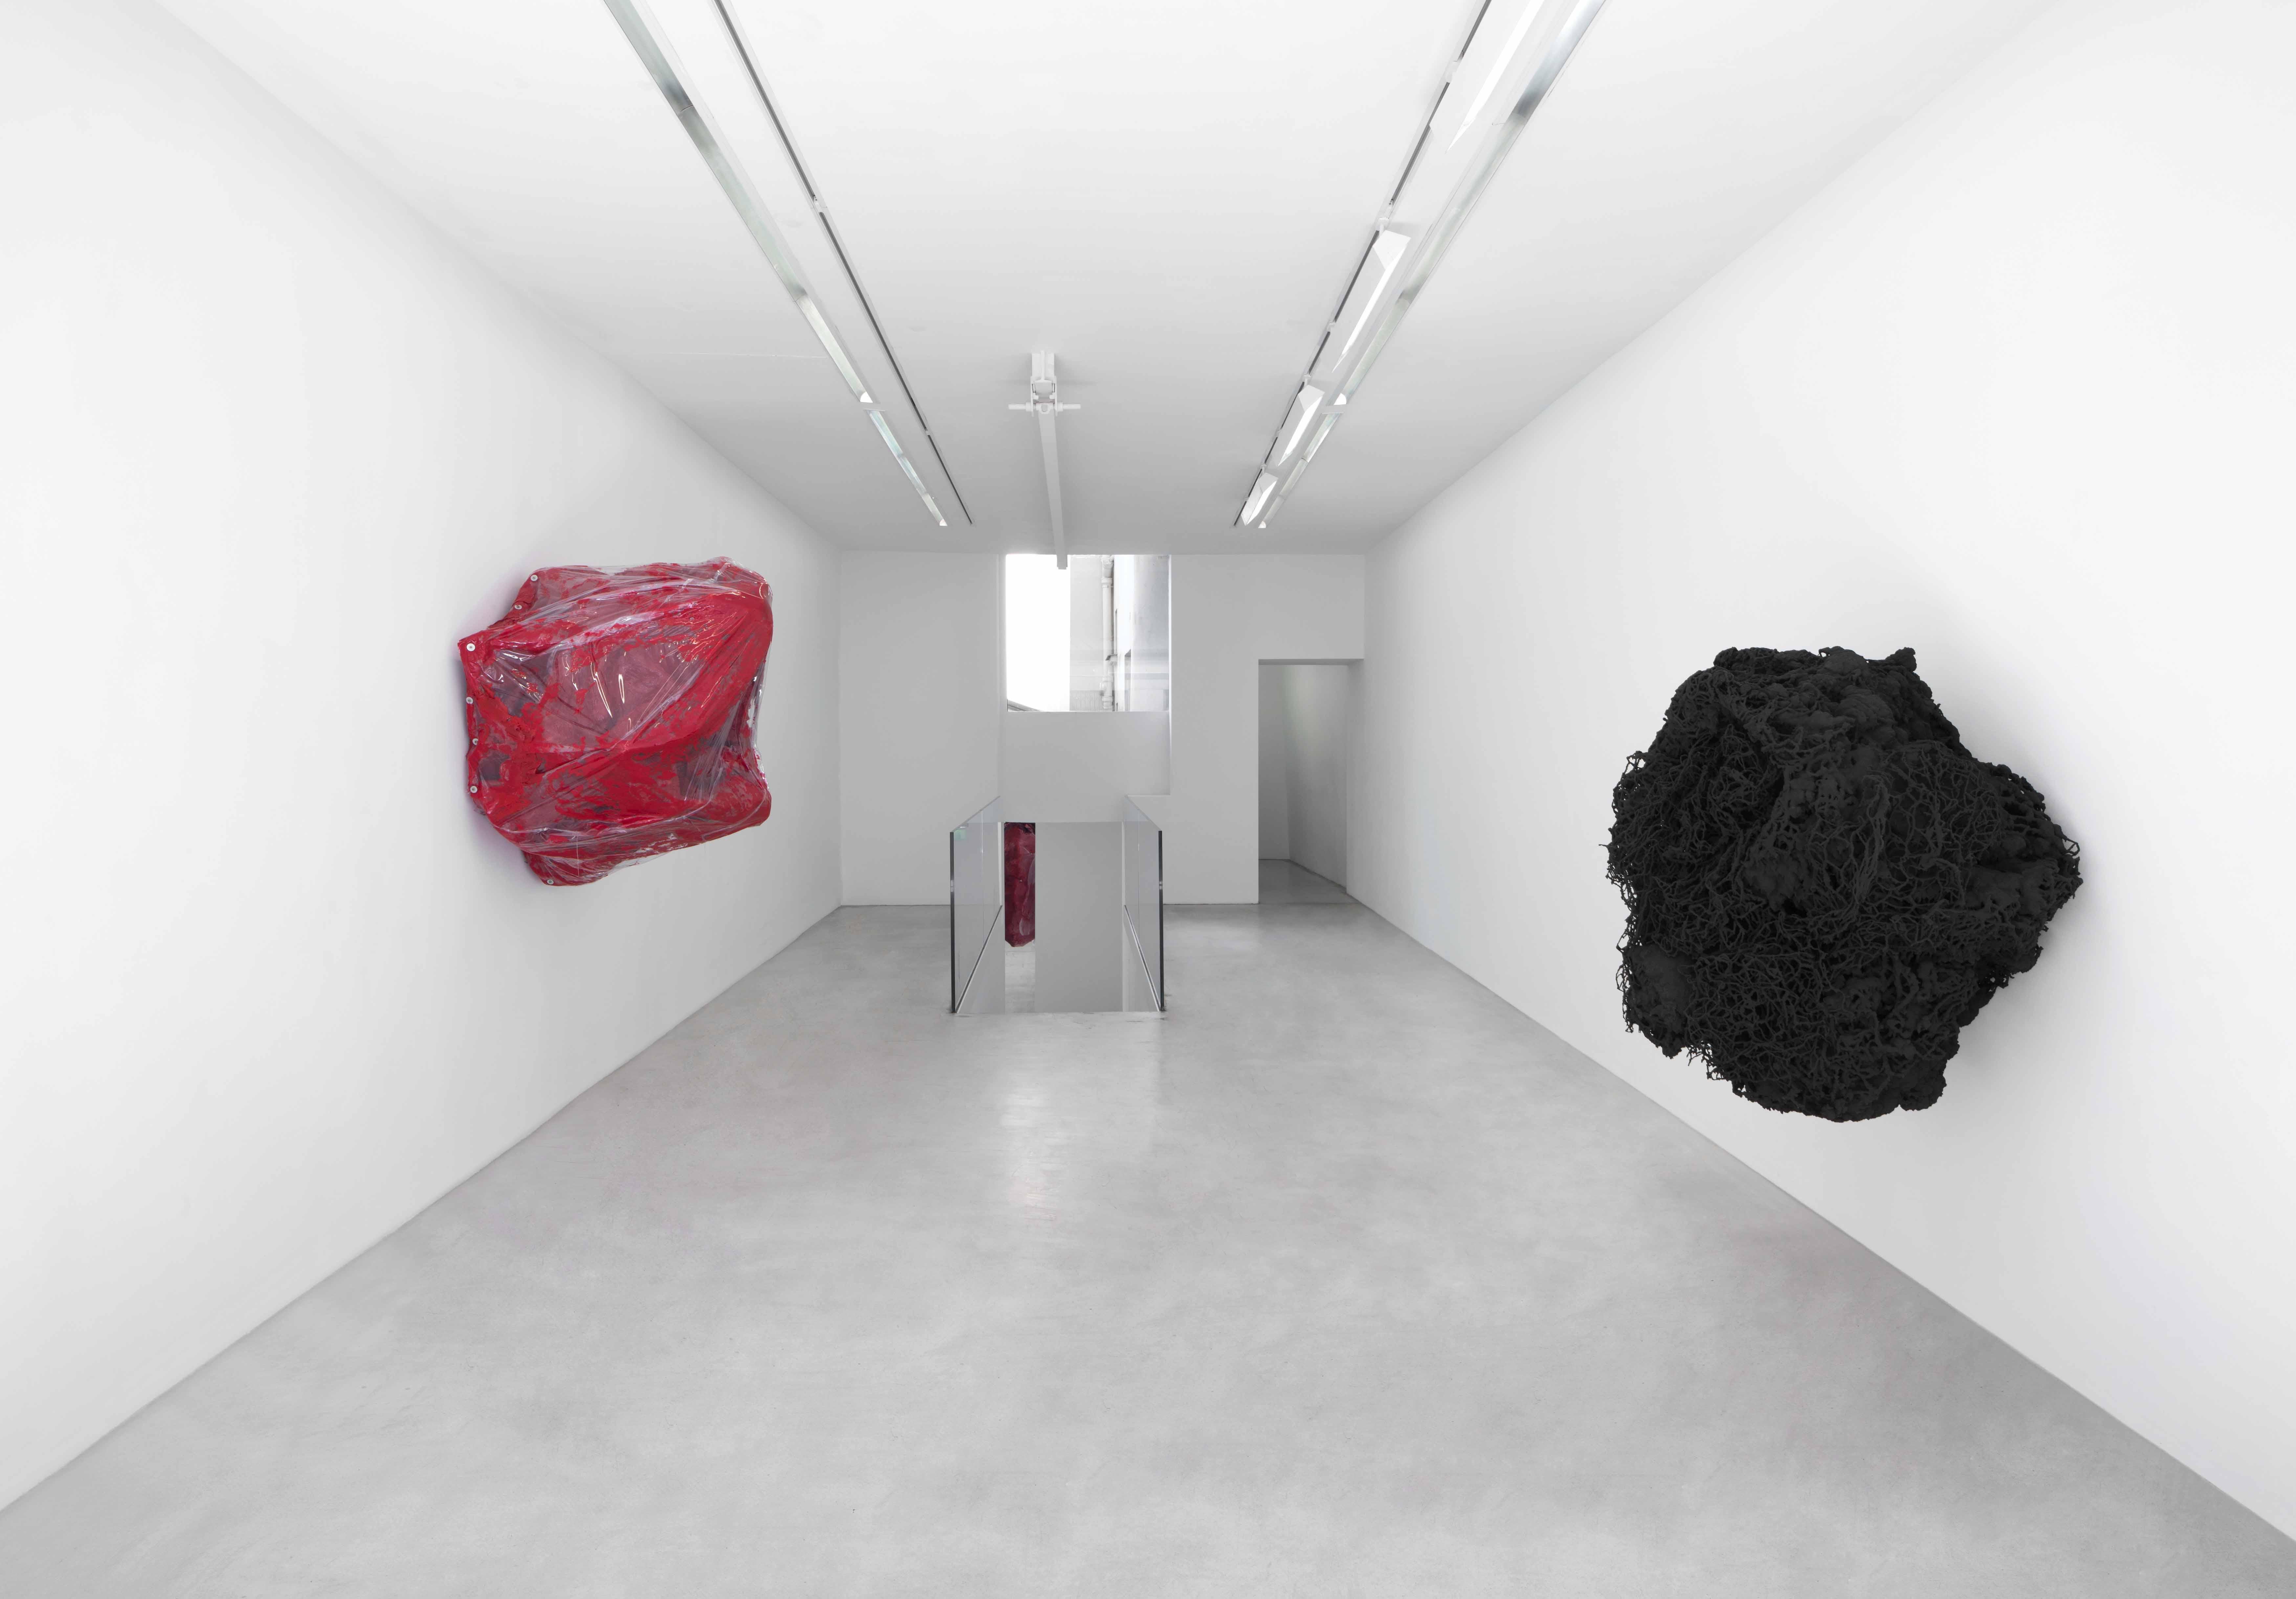 Anish Kapoor, Open Secret, 2018 / Knot, 2018 / Vue de l'exposition « Another (M)other », Kamel Mennour © ADAGP Anish Kapoor 2018, courtesy the artist and Kamel Mennour